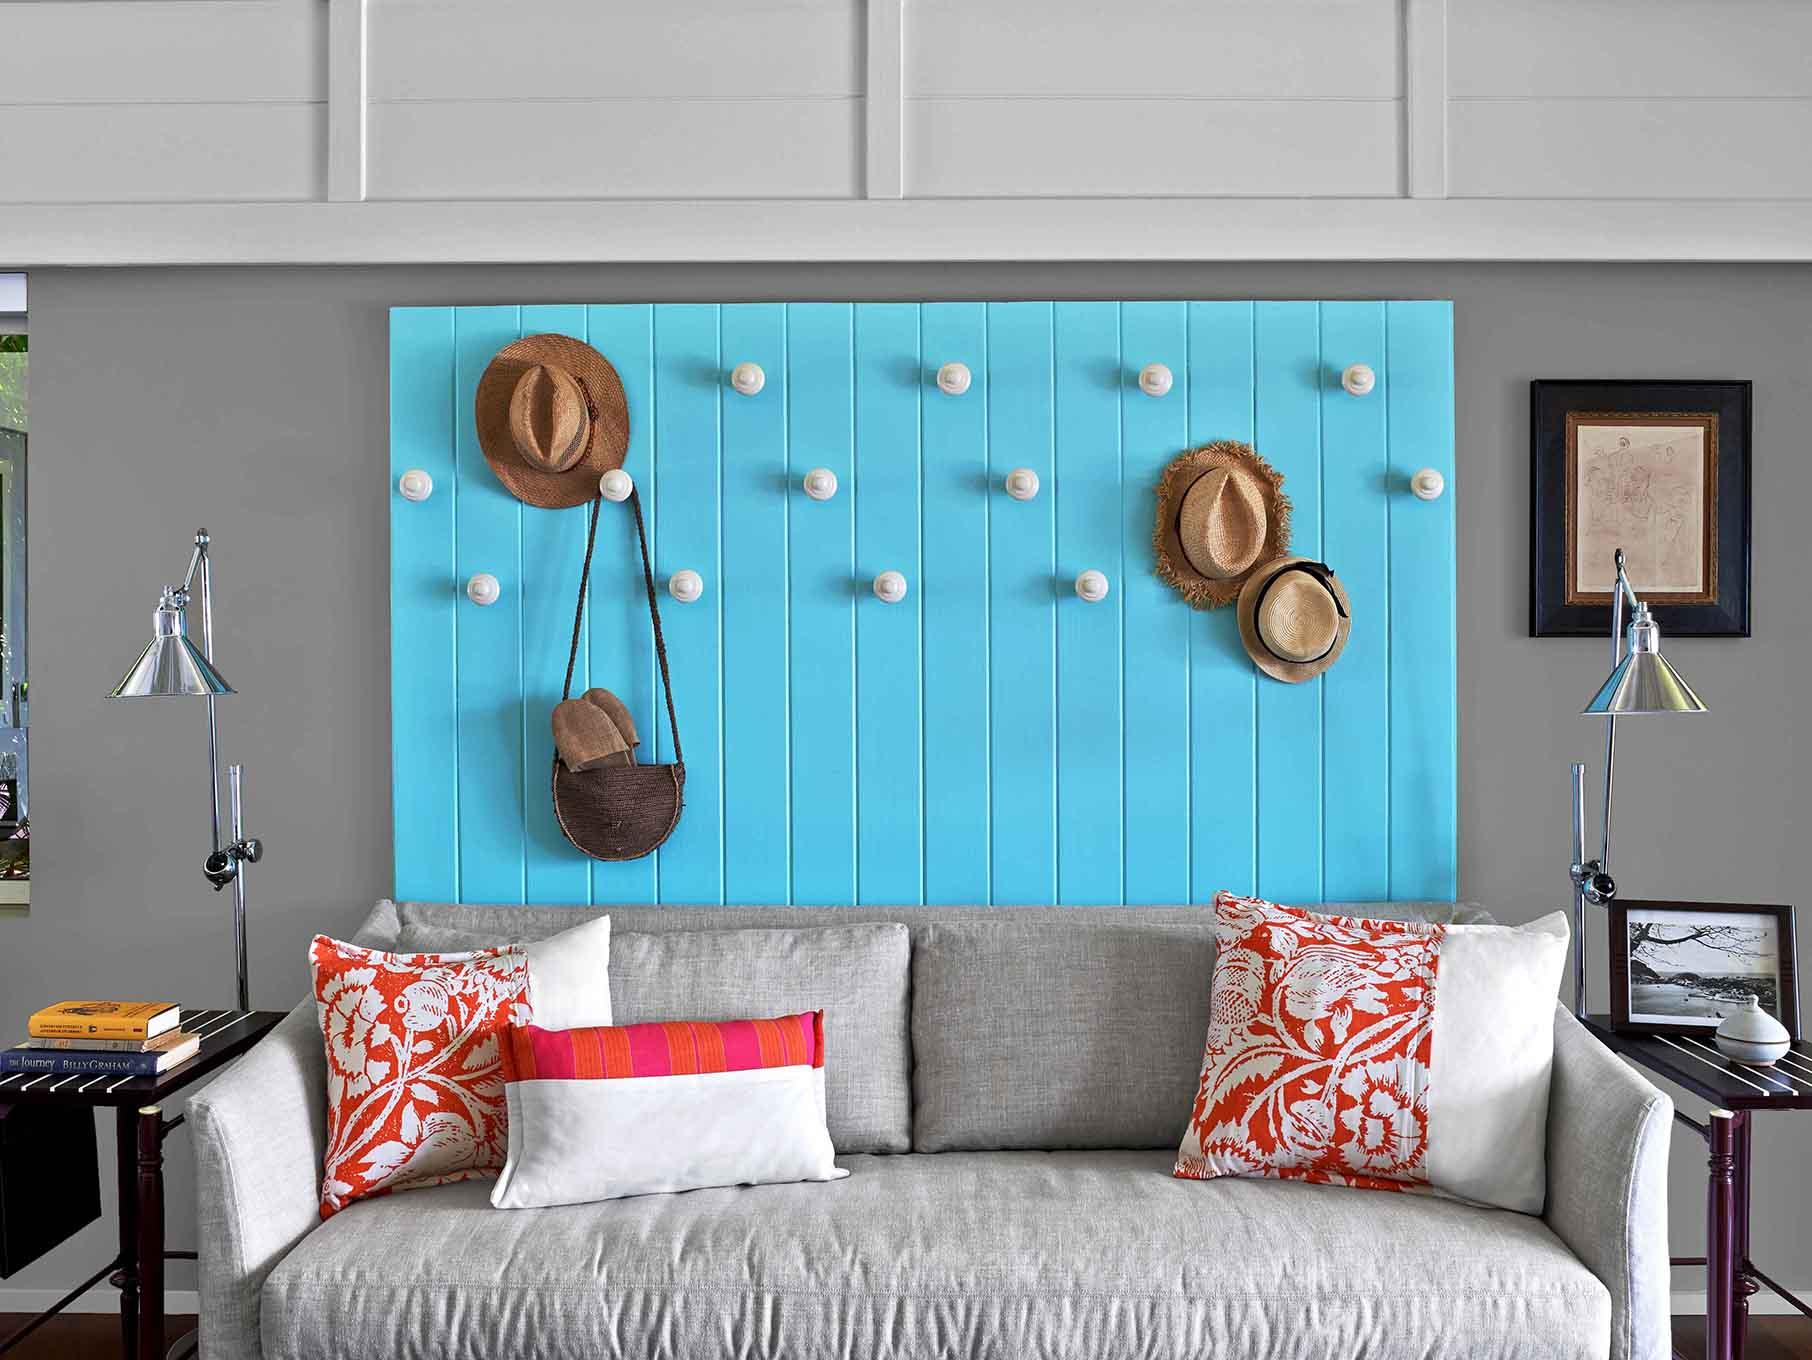 luis-pons-design-interior-tropical-hotel-stbarths_11.jpg